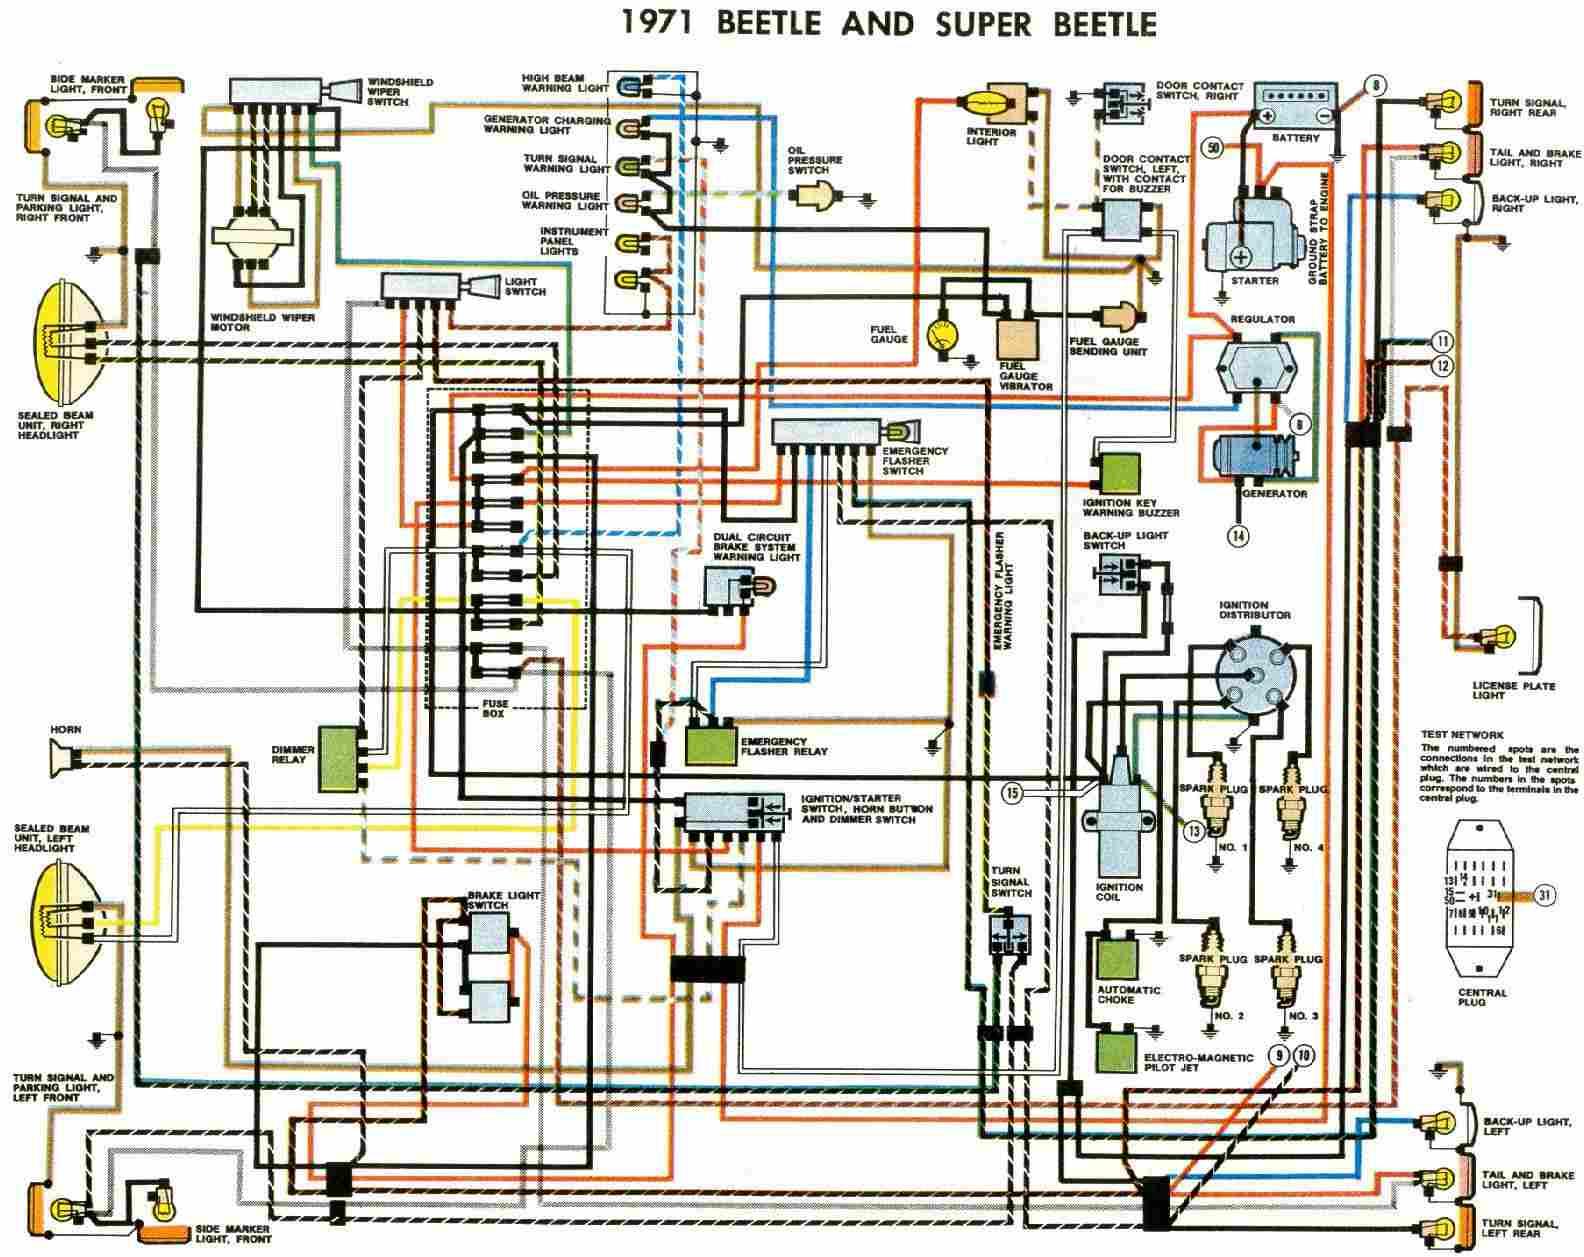 2000 volkswagen beetle wiring diagram free picture